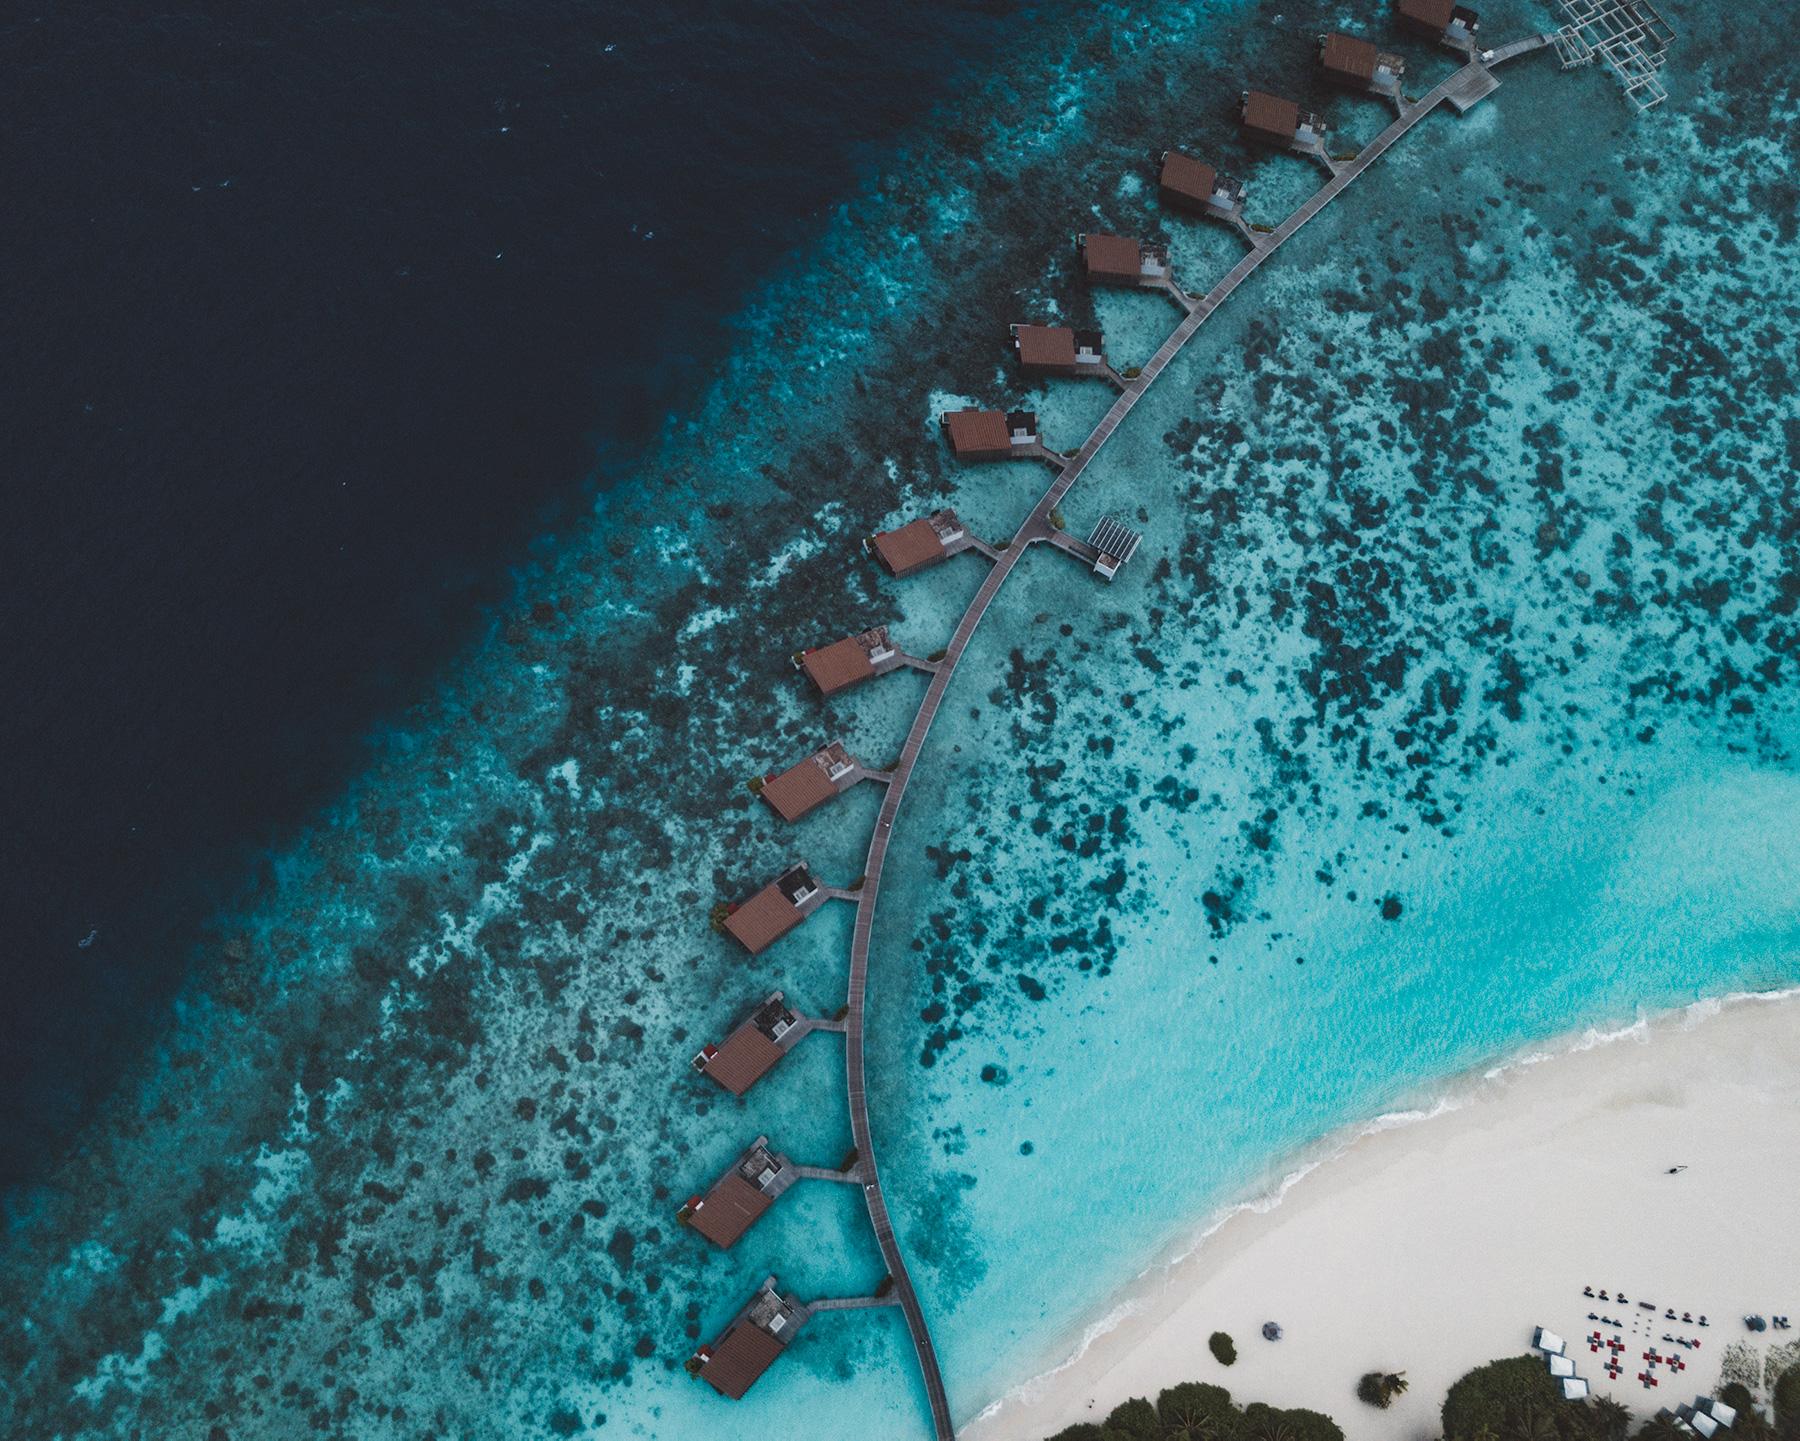 Aearial view of Park Hyatt Hadahaa Maldives Leading Resort